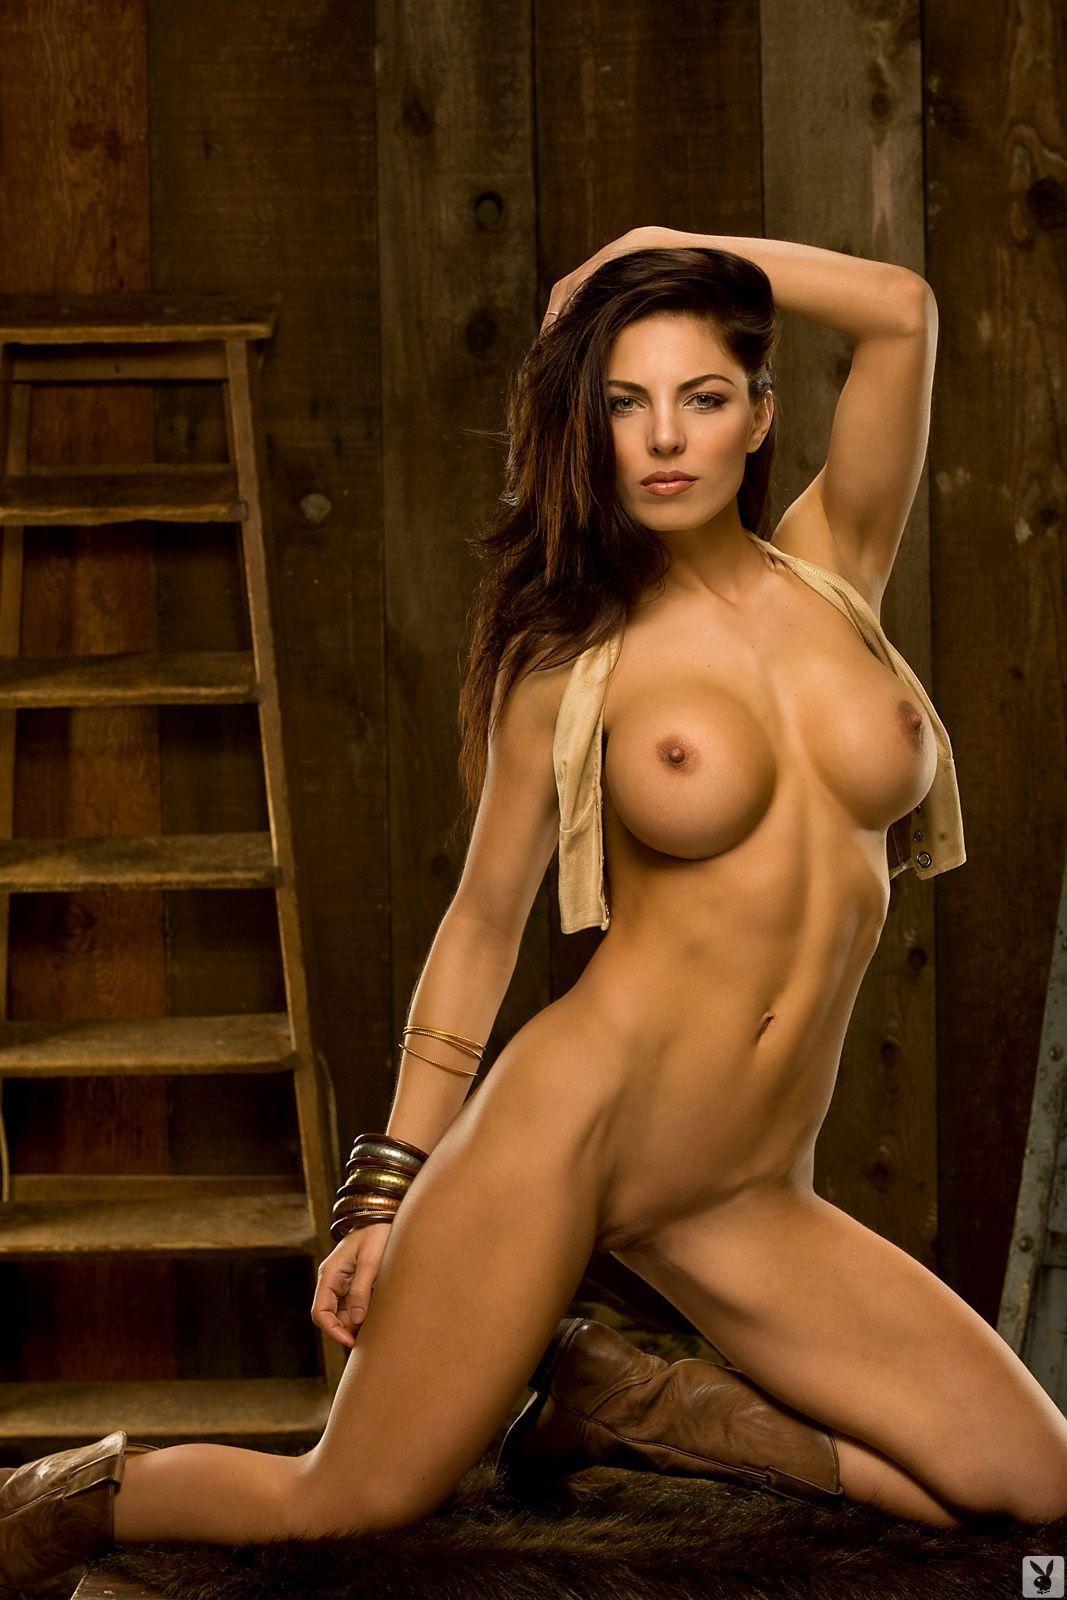 Hot Playboy Girls Video